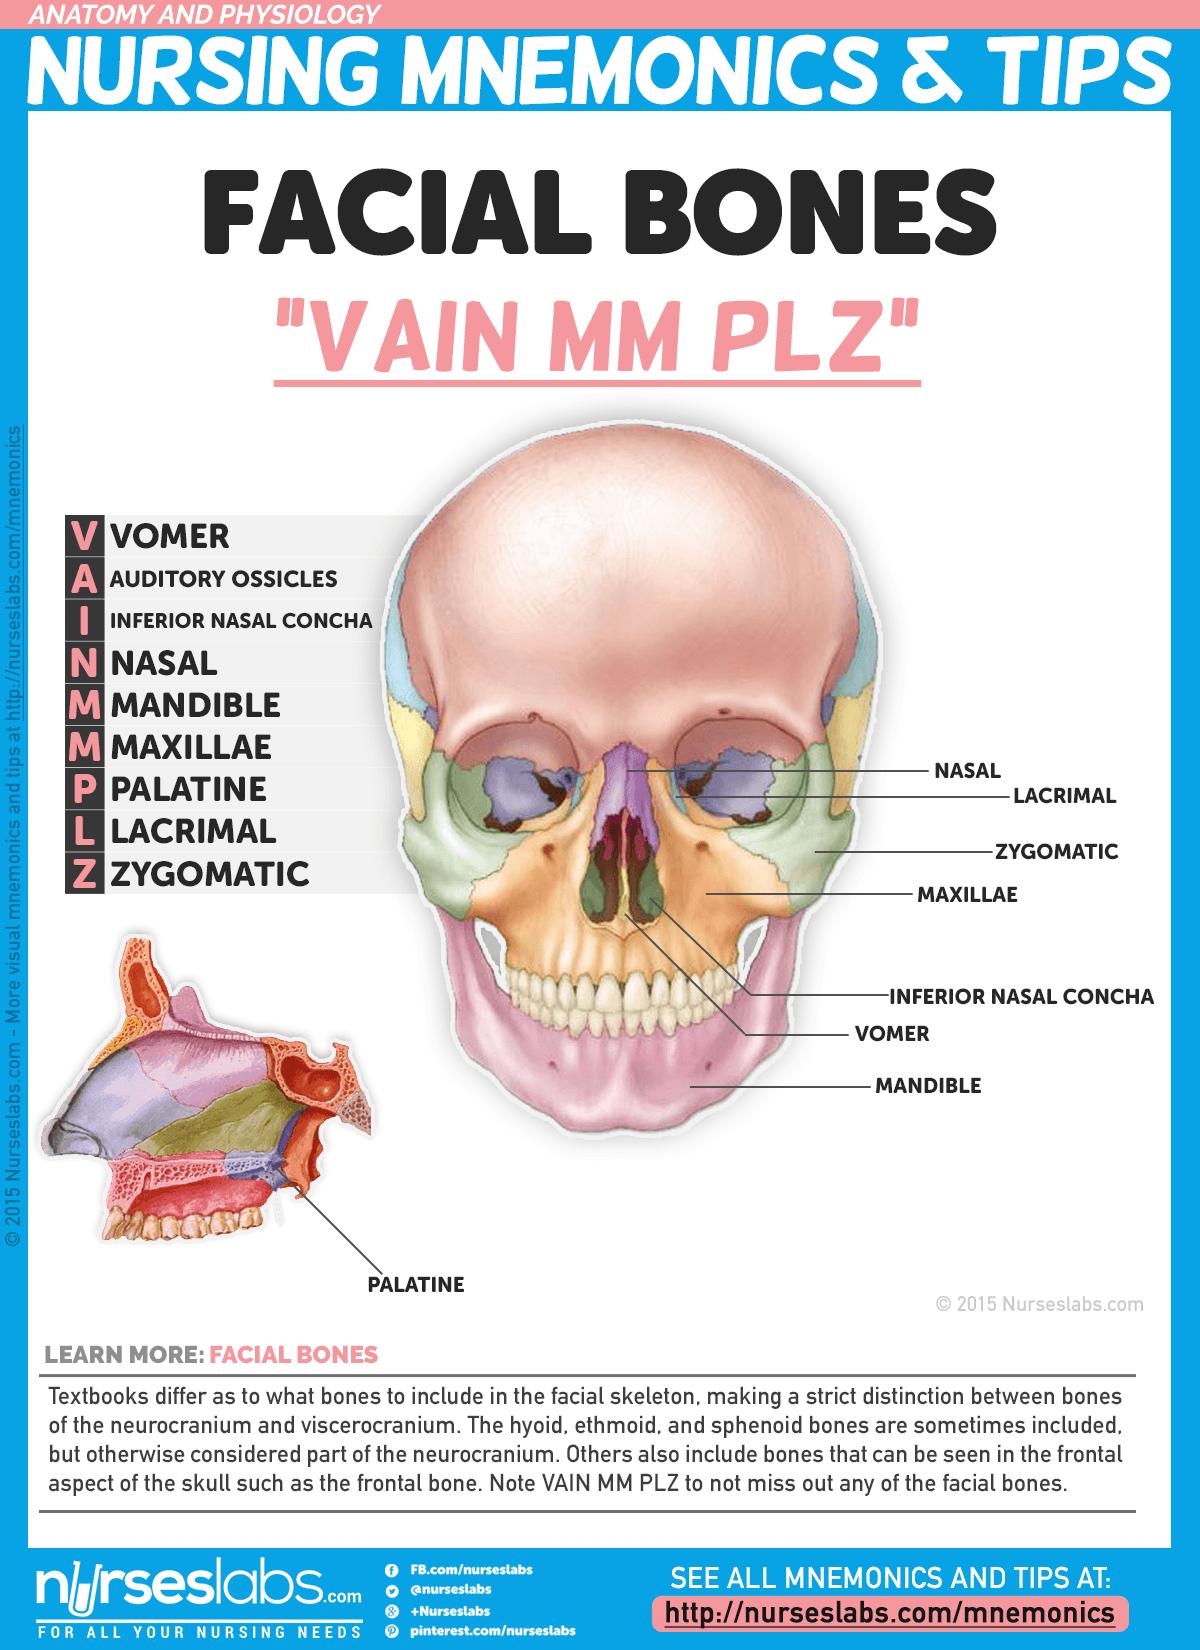 Anatomy and Physiology Nursing Mnemonics & Tips | Pinterest